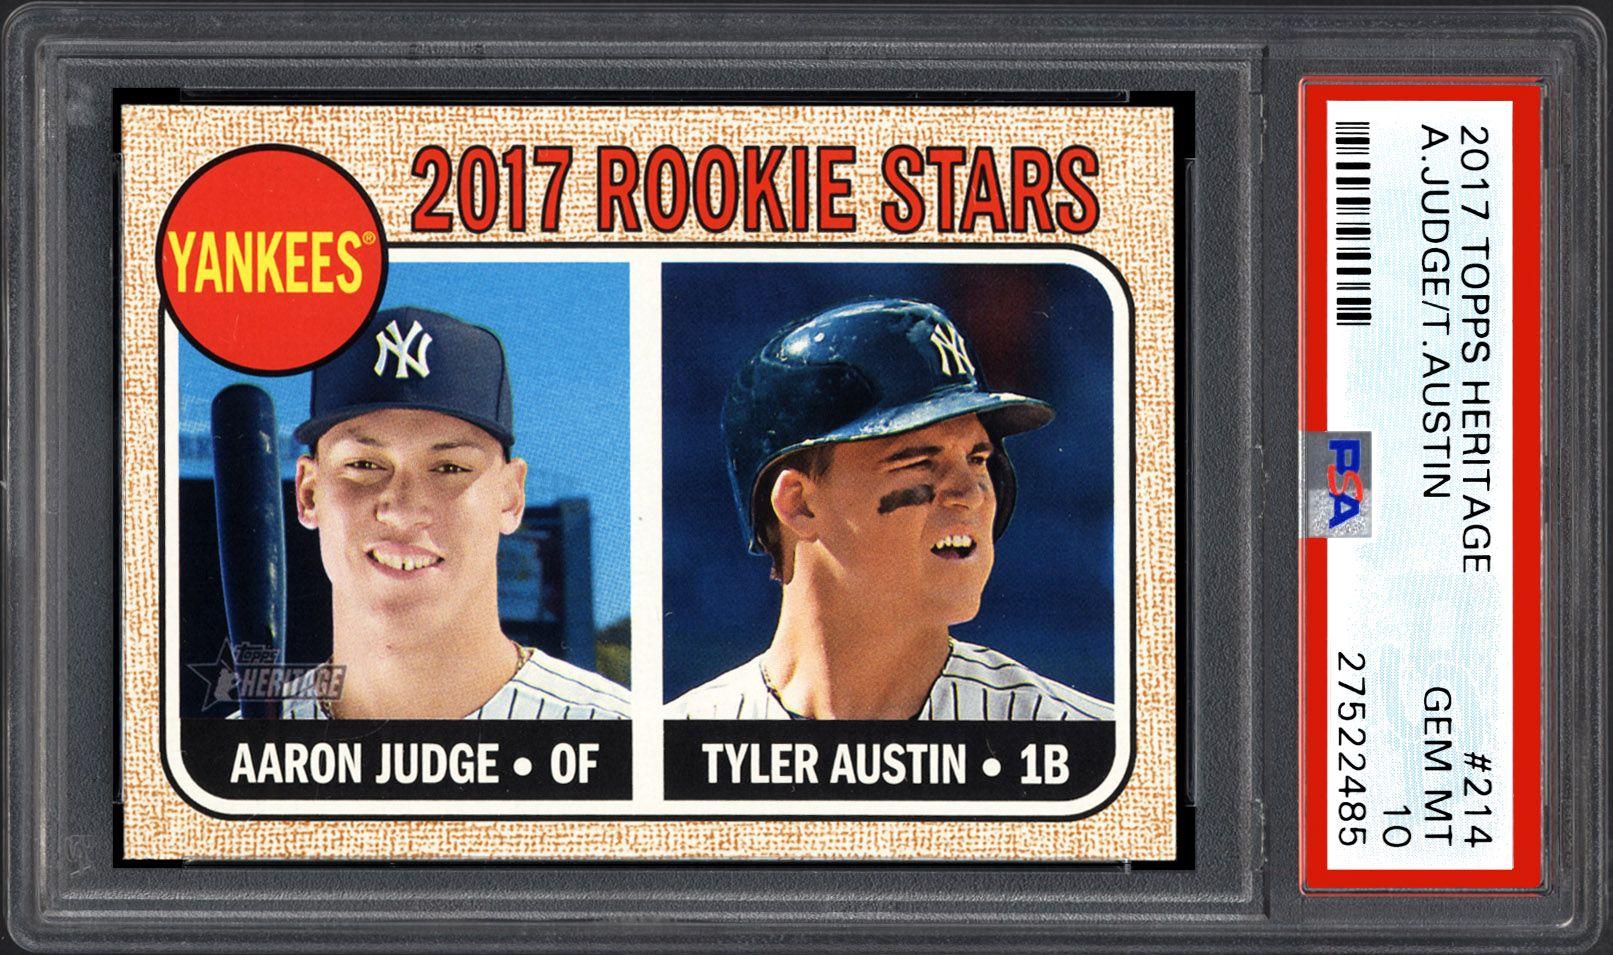 2017 Topps Heritage Baseball Cards Psa Smr Price Guide